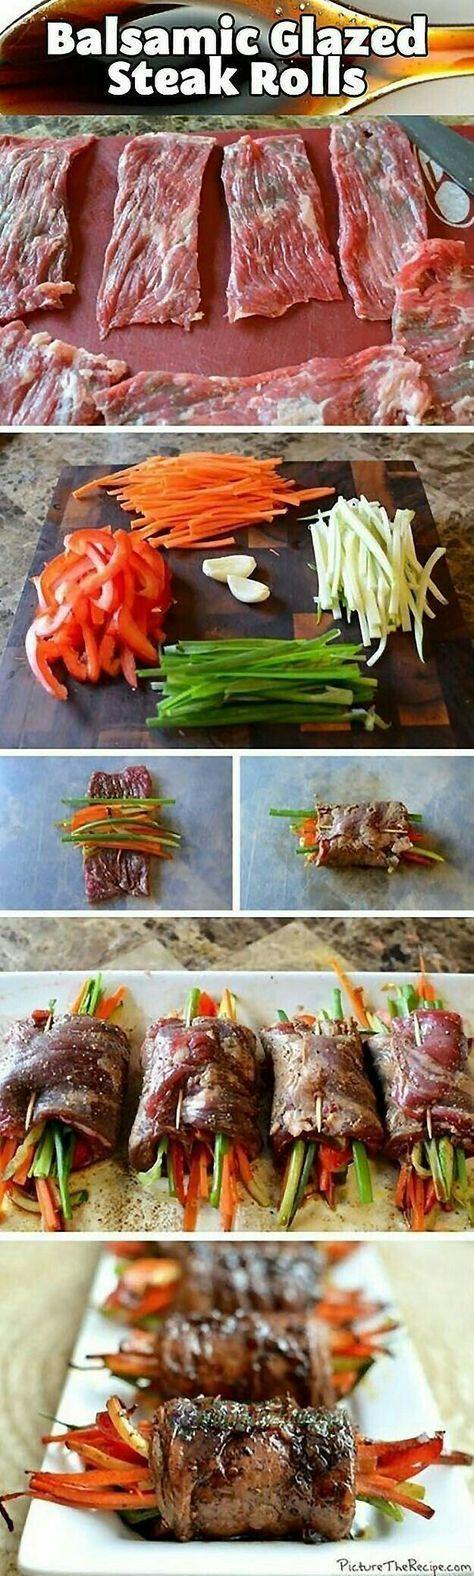 Balsamic glazed steak rolls recipe